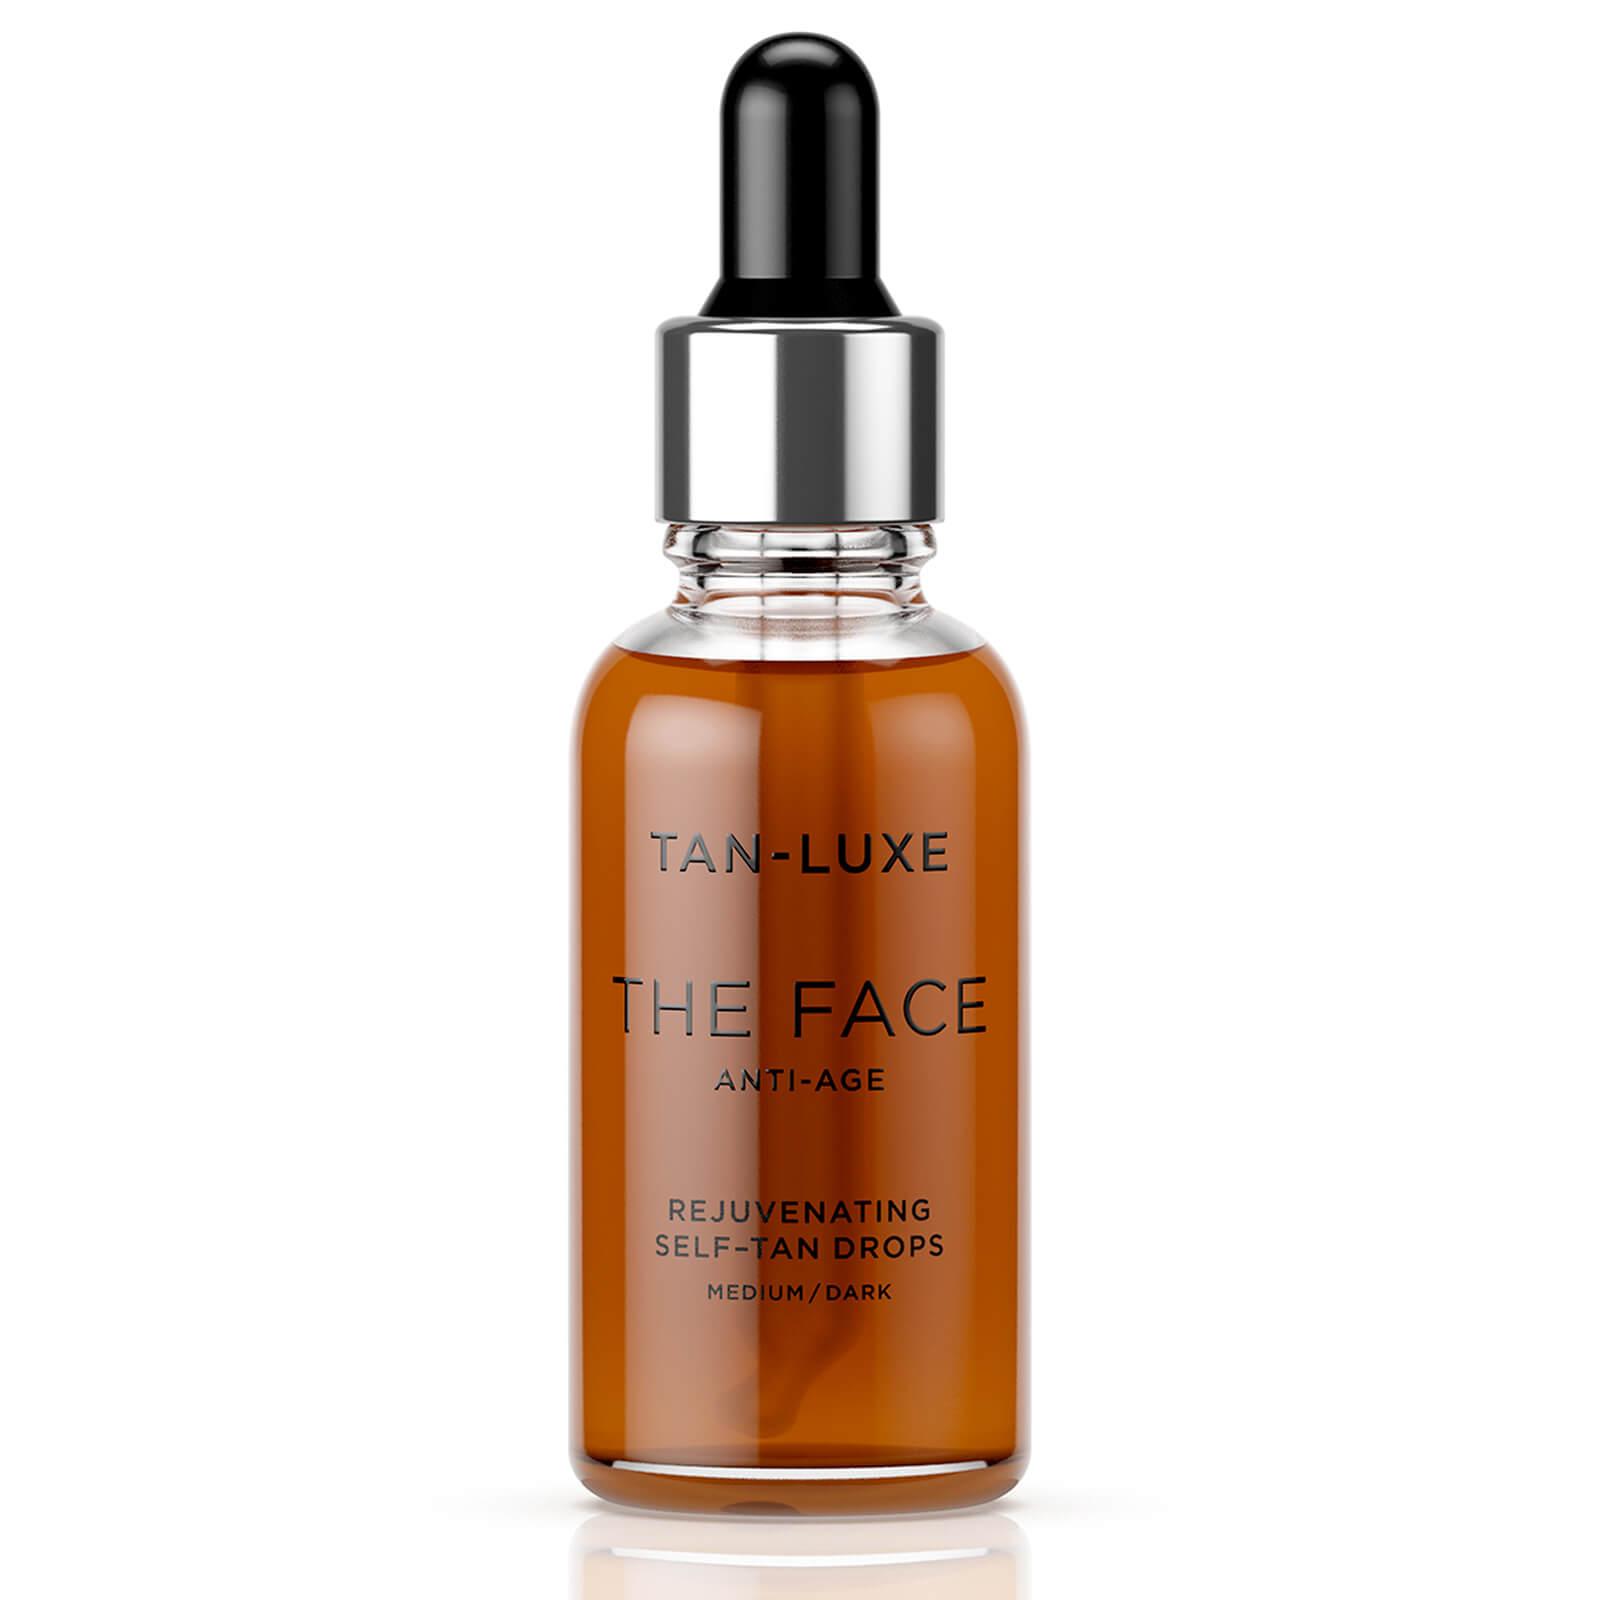 Купить Tan-Luxe The Face Anti-Age Rejuvenating Self-Tan Drops 30ml - Medium/Dark